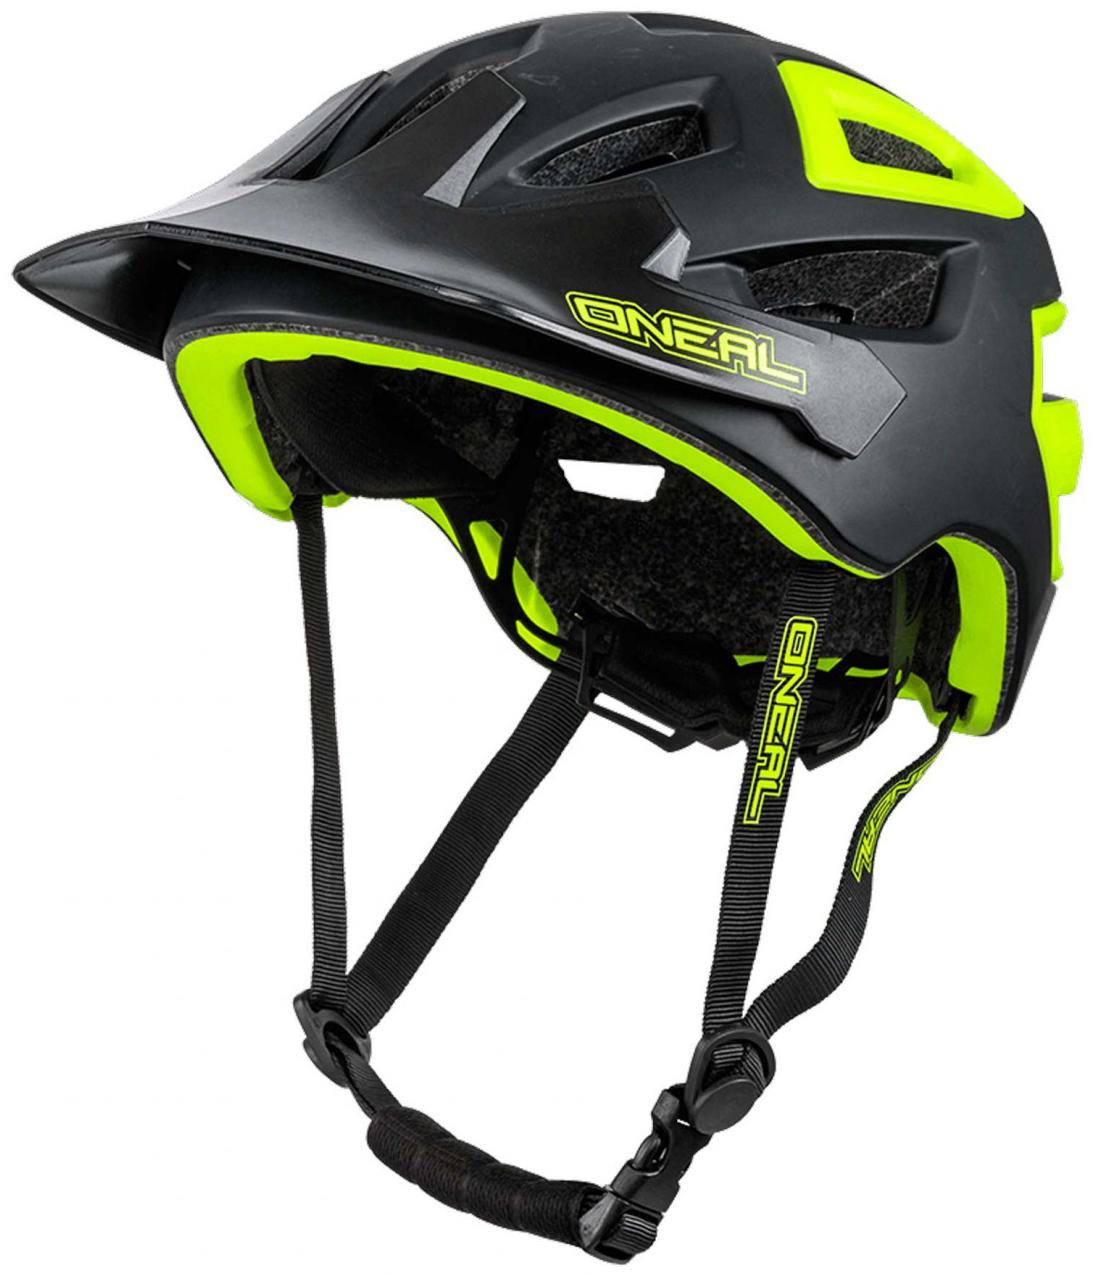 O'neal Pike Enduro Helmet